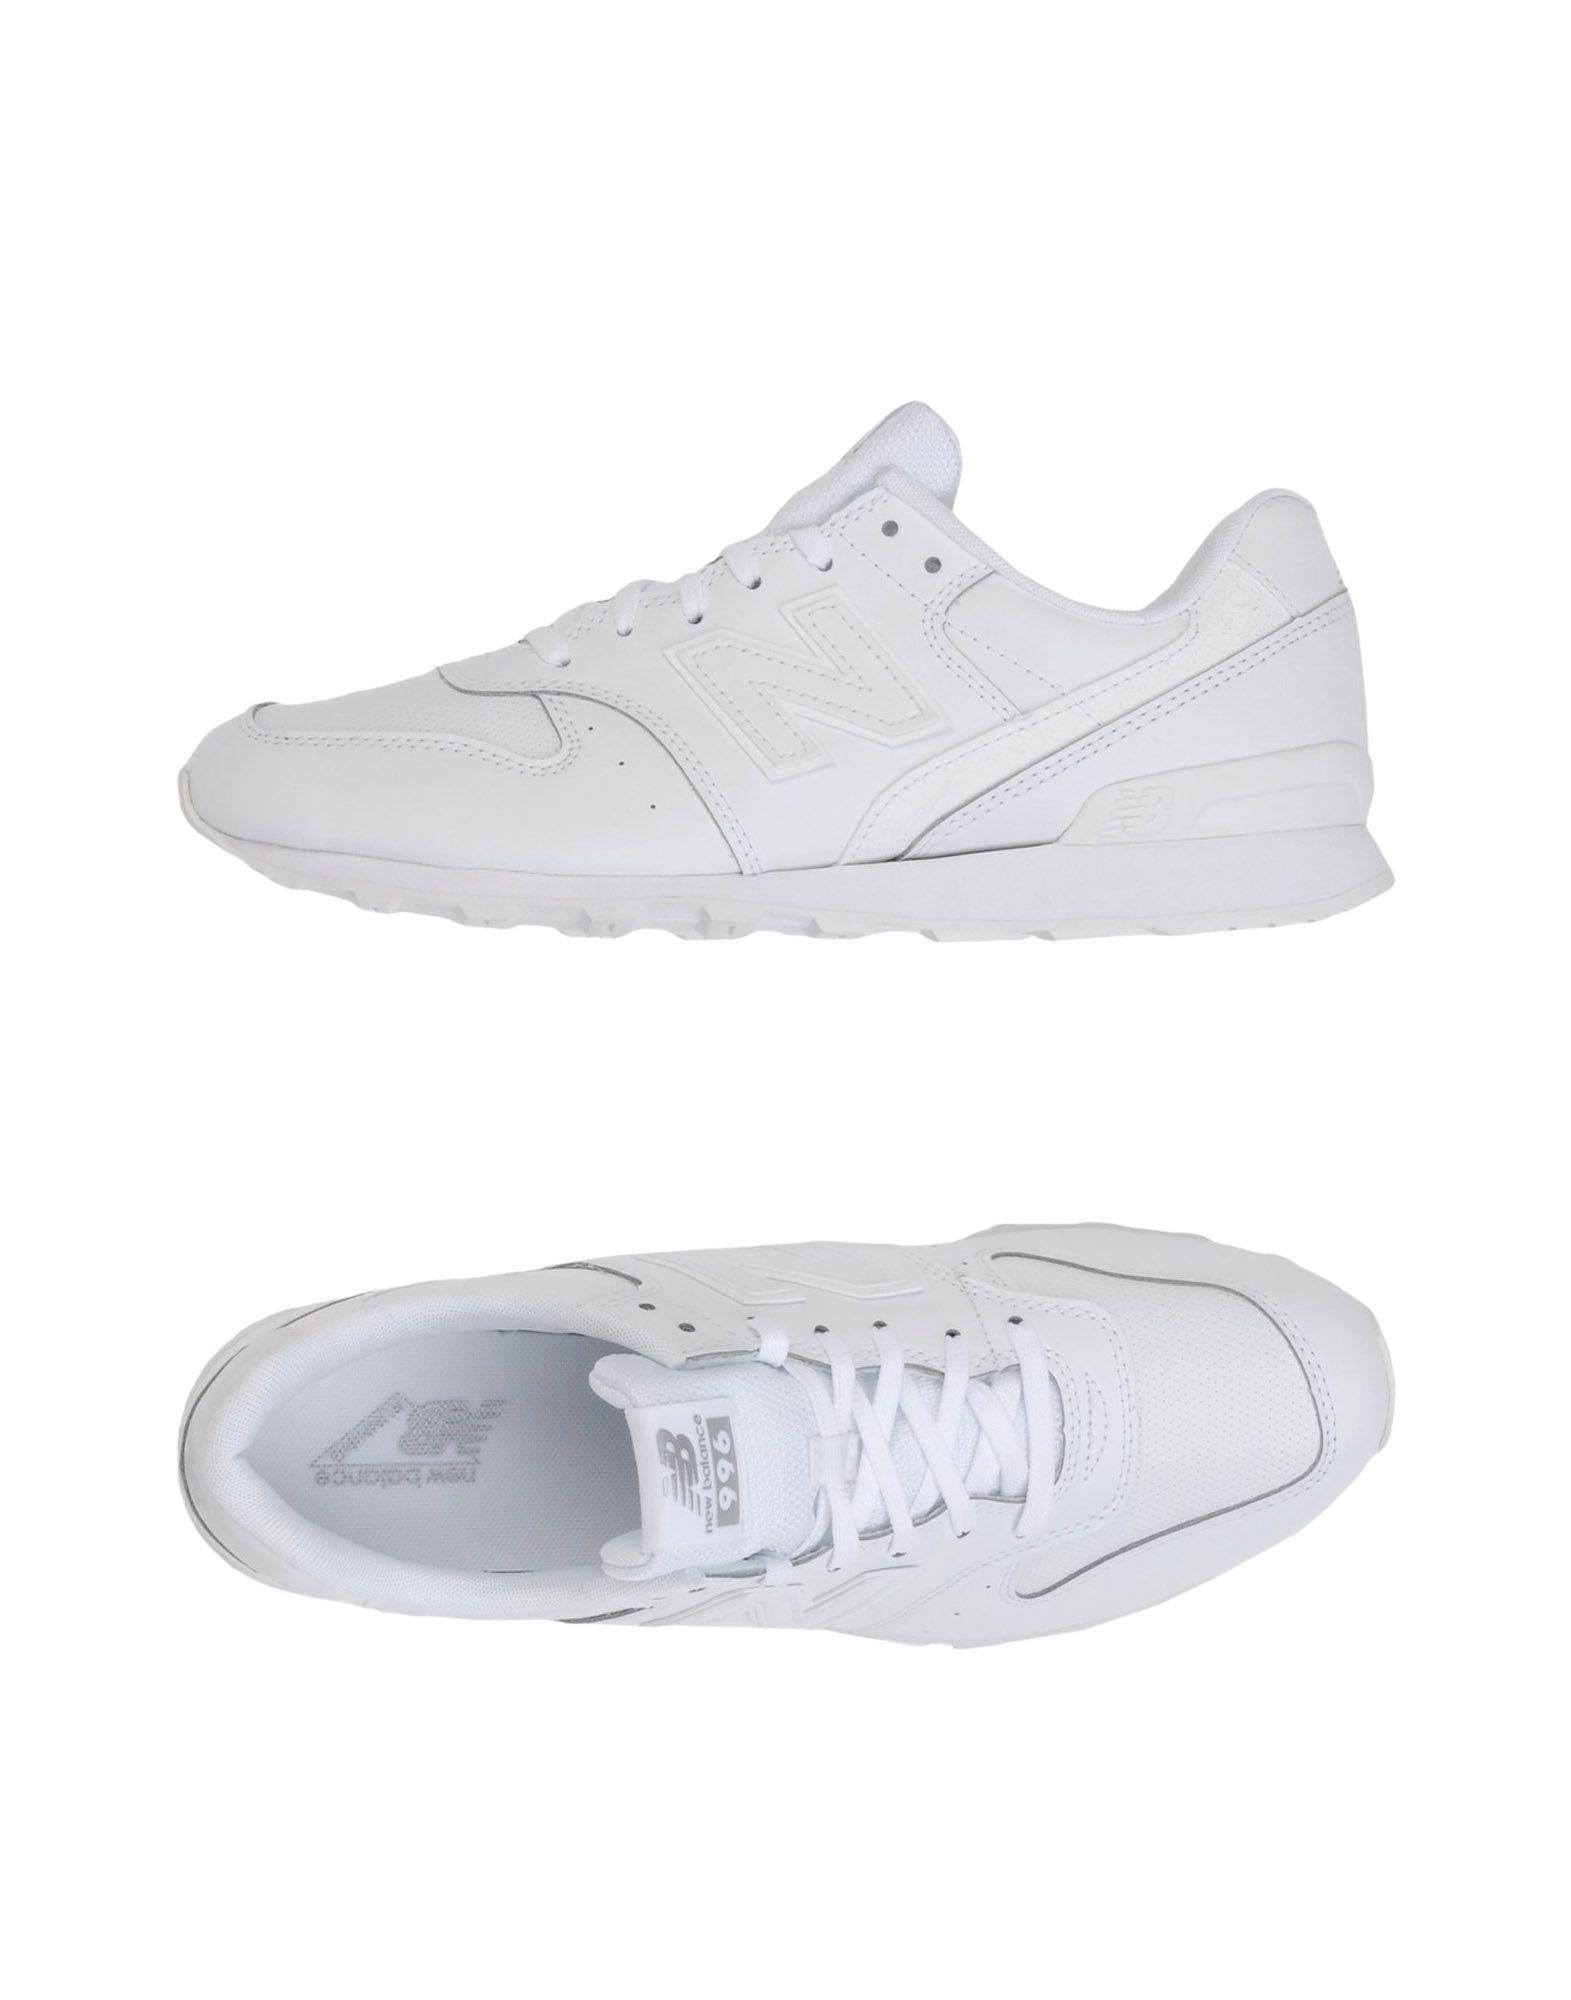 Sneakers New Balance 996 Premium - Donna - 11466918JH